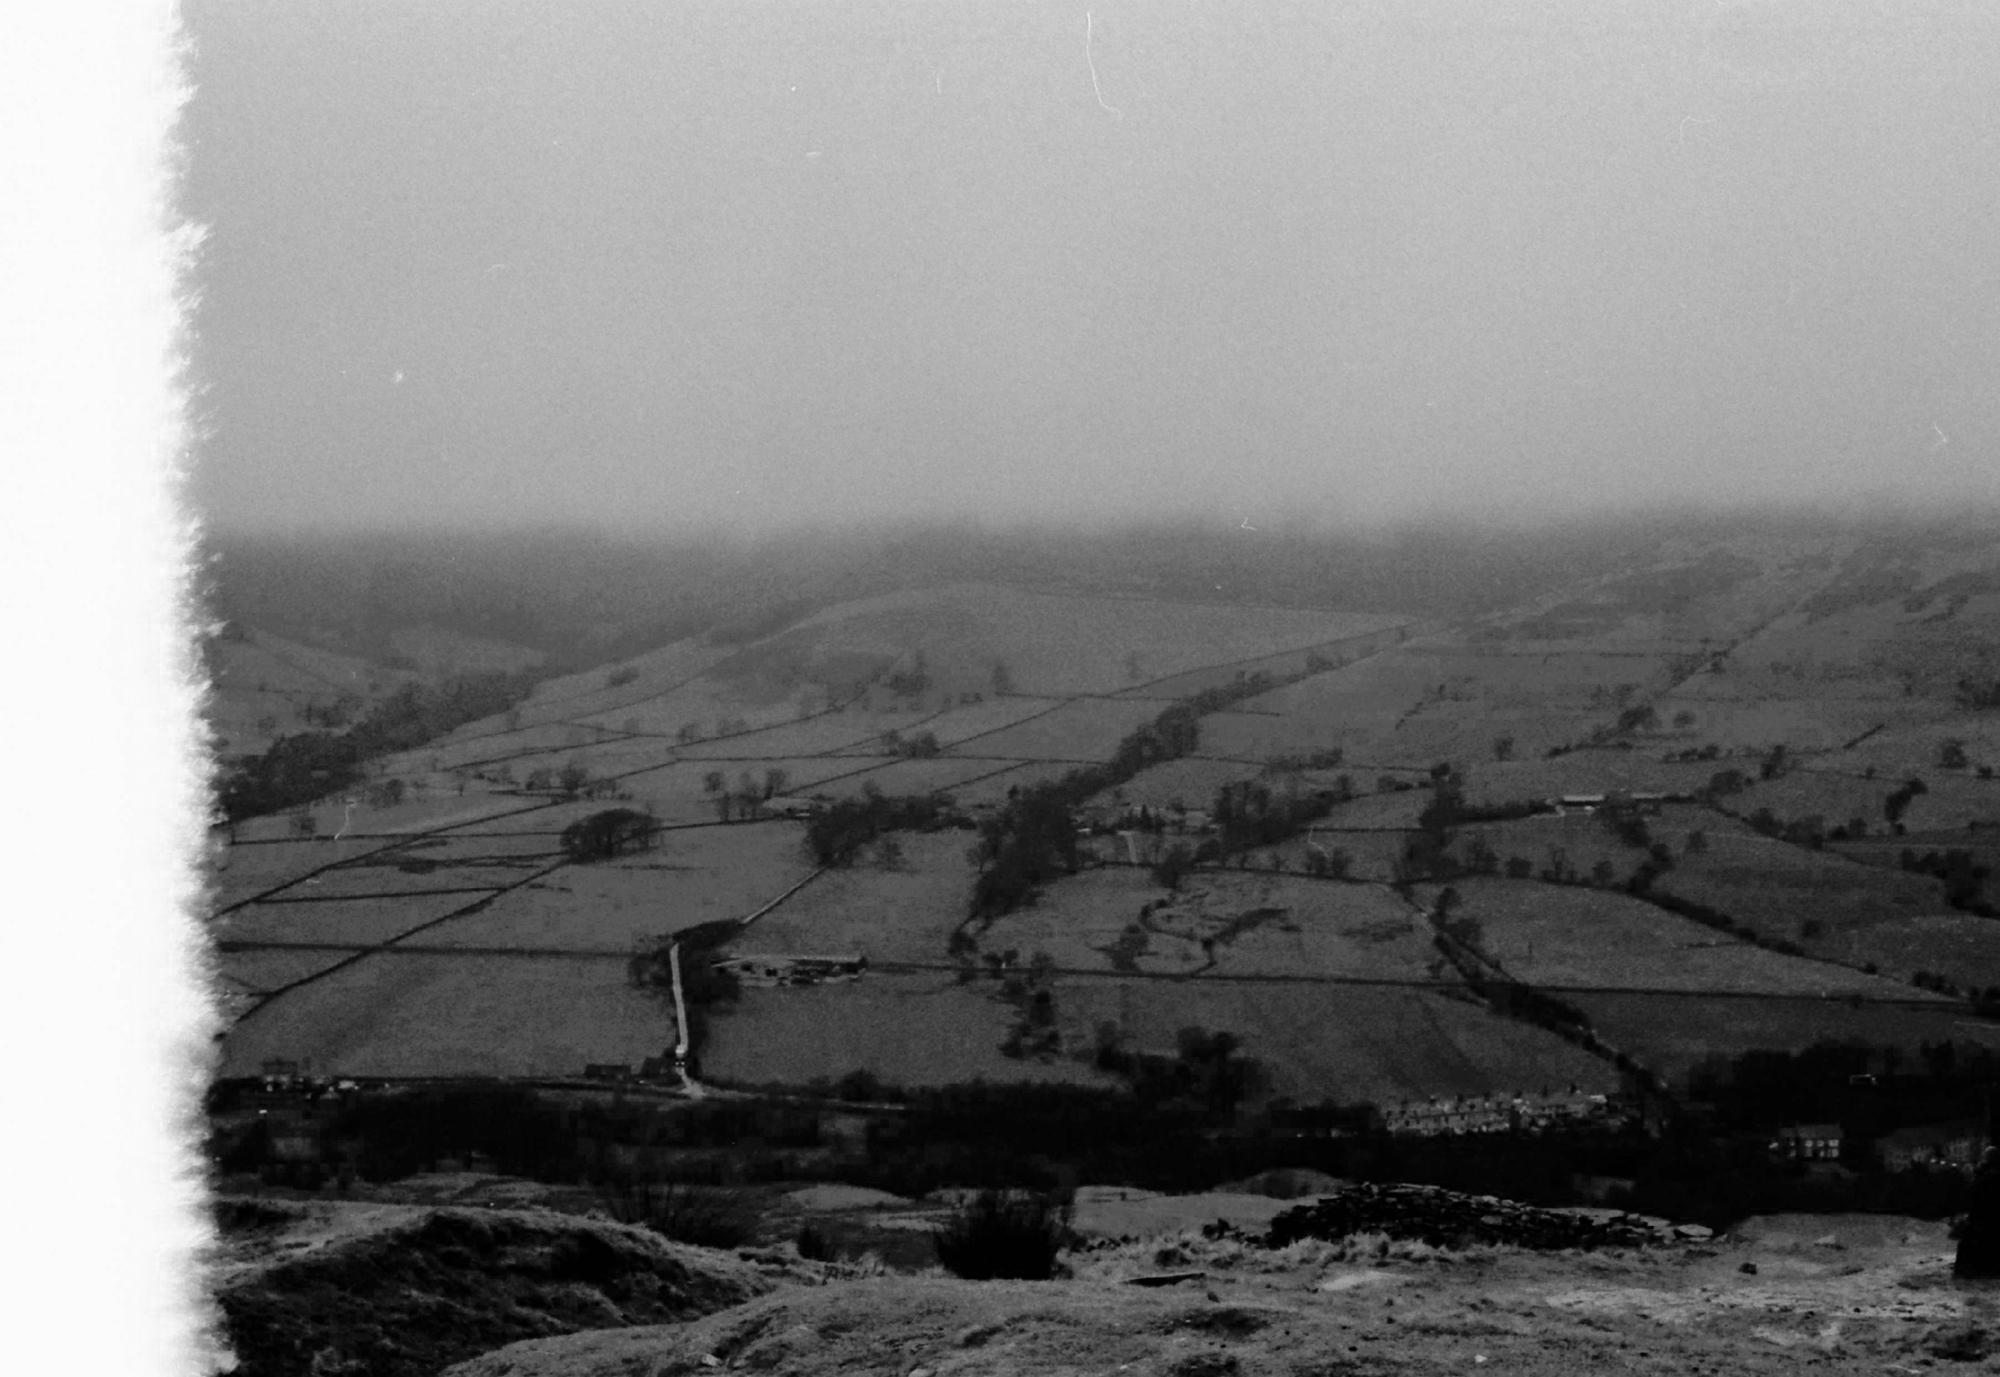 35mm Memories of Albion